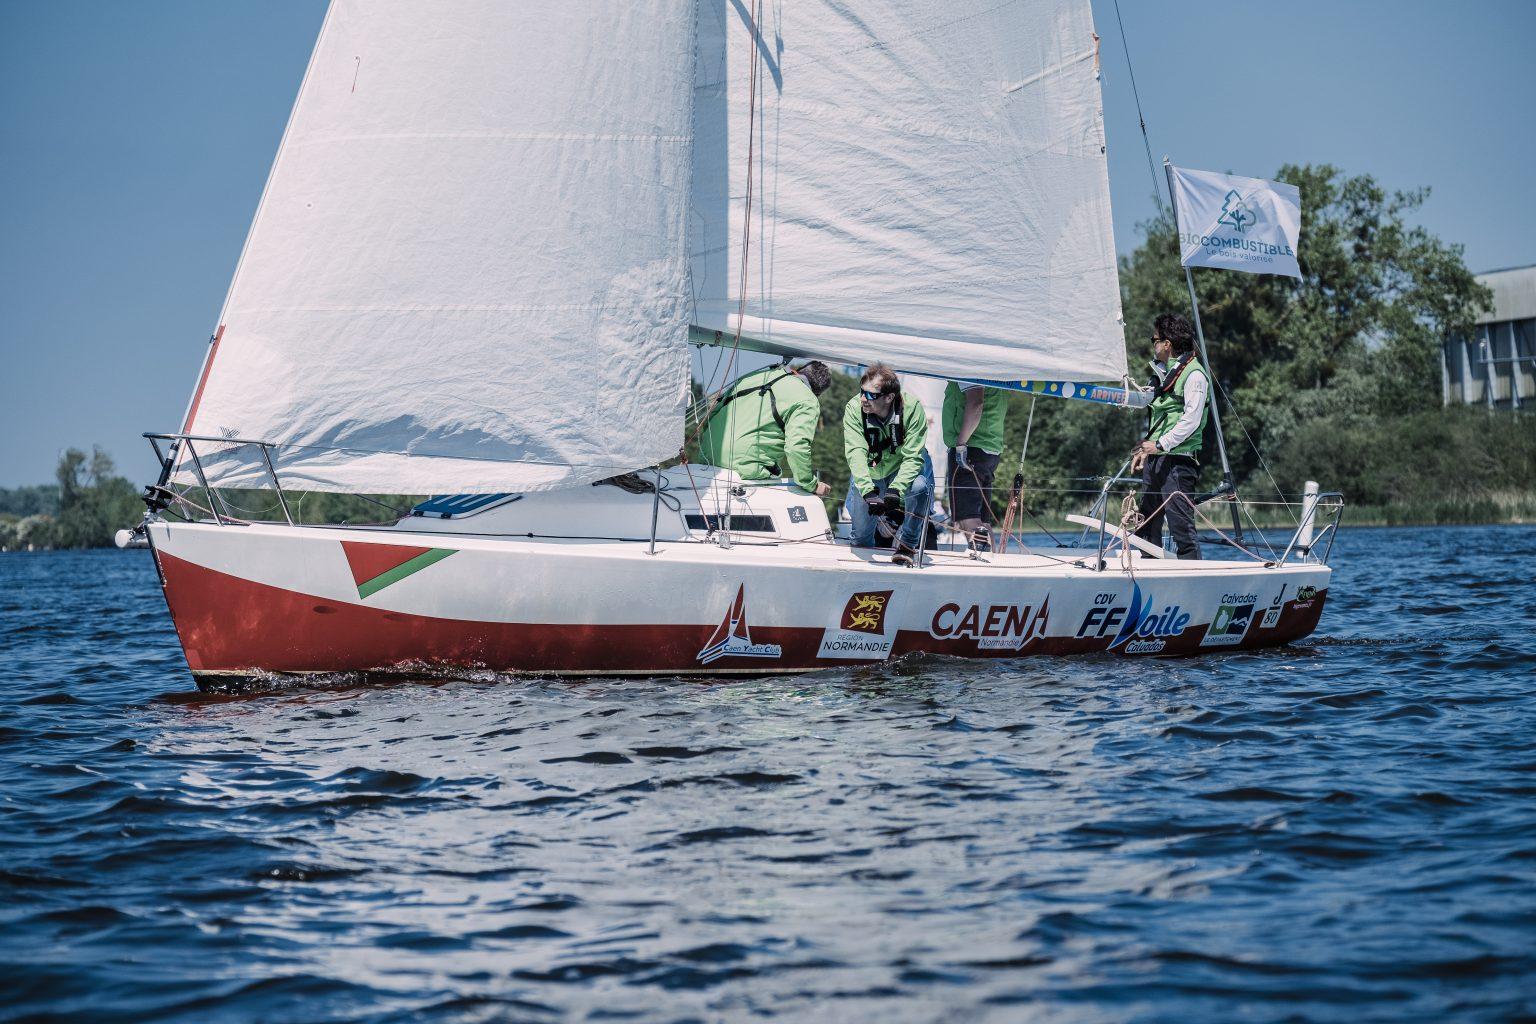 Sailing Regatta Team Building Voile Bateaux Incentive Equipe